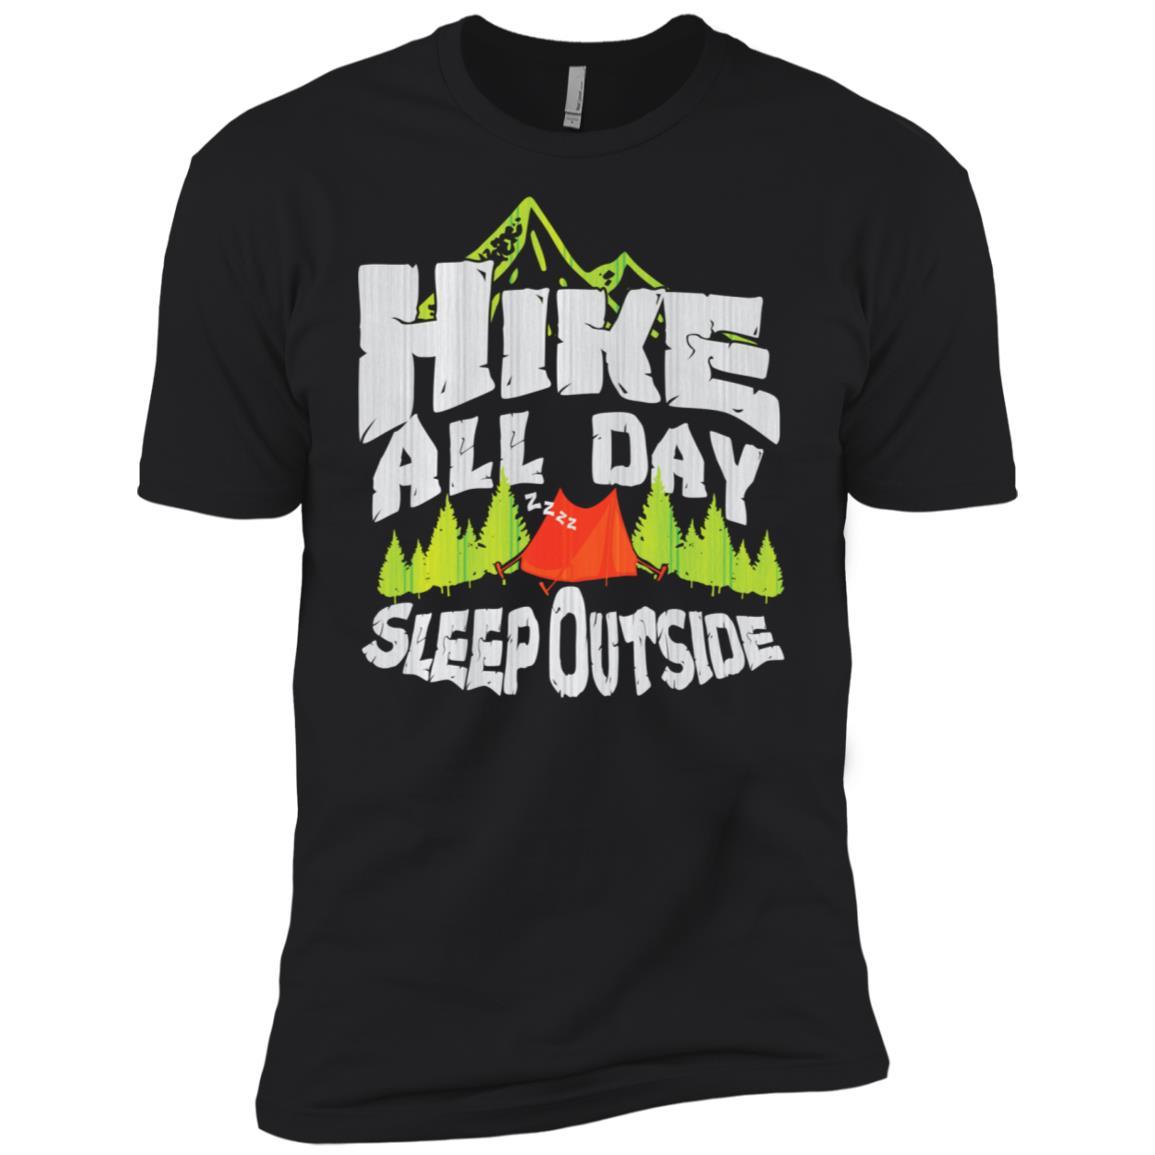 Forrest Hiker Camping Outdoor Nature Lover Gift Men Short Sleeve T-Shirt